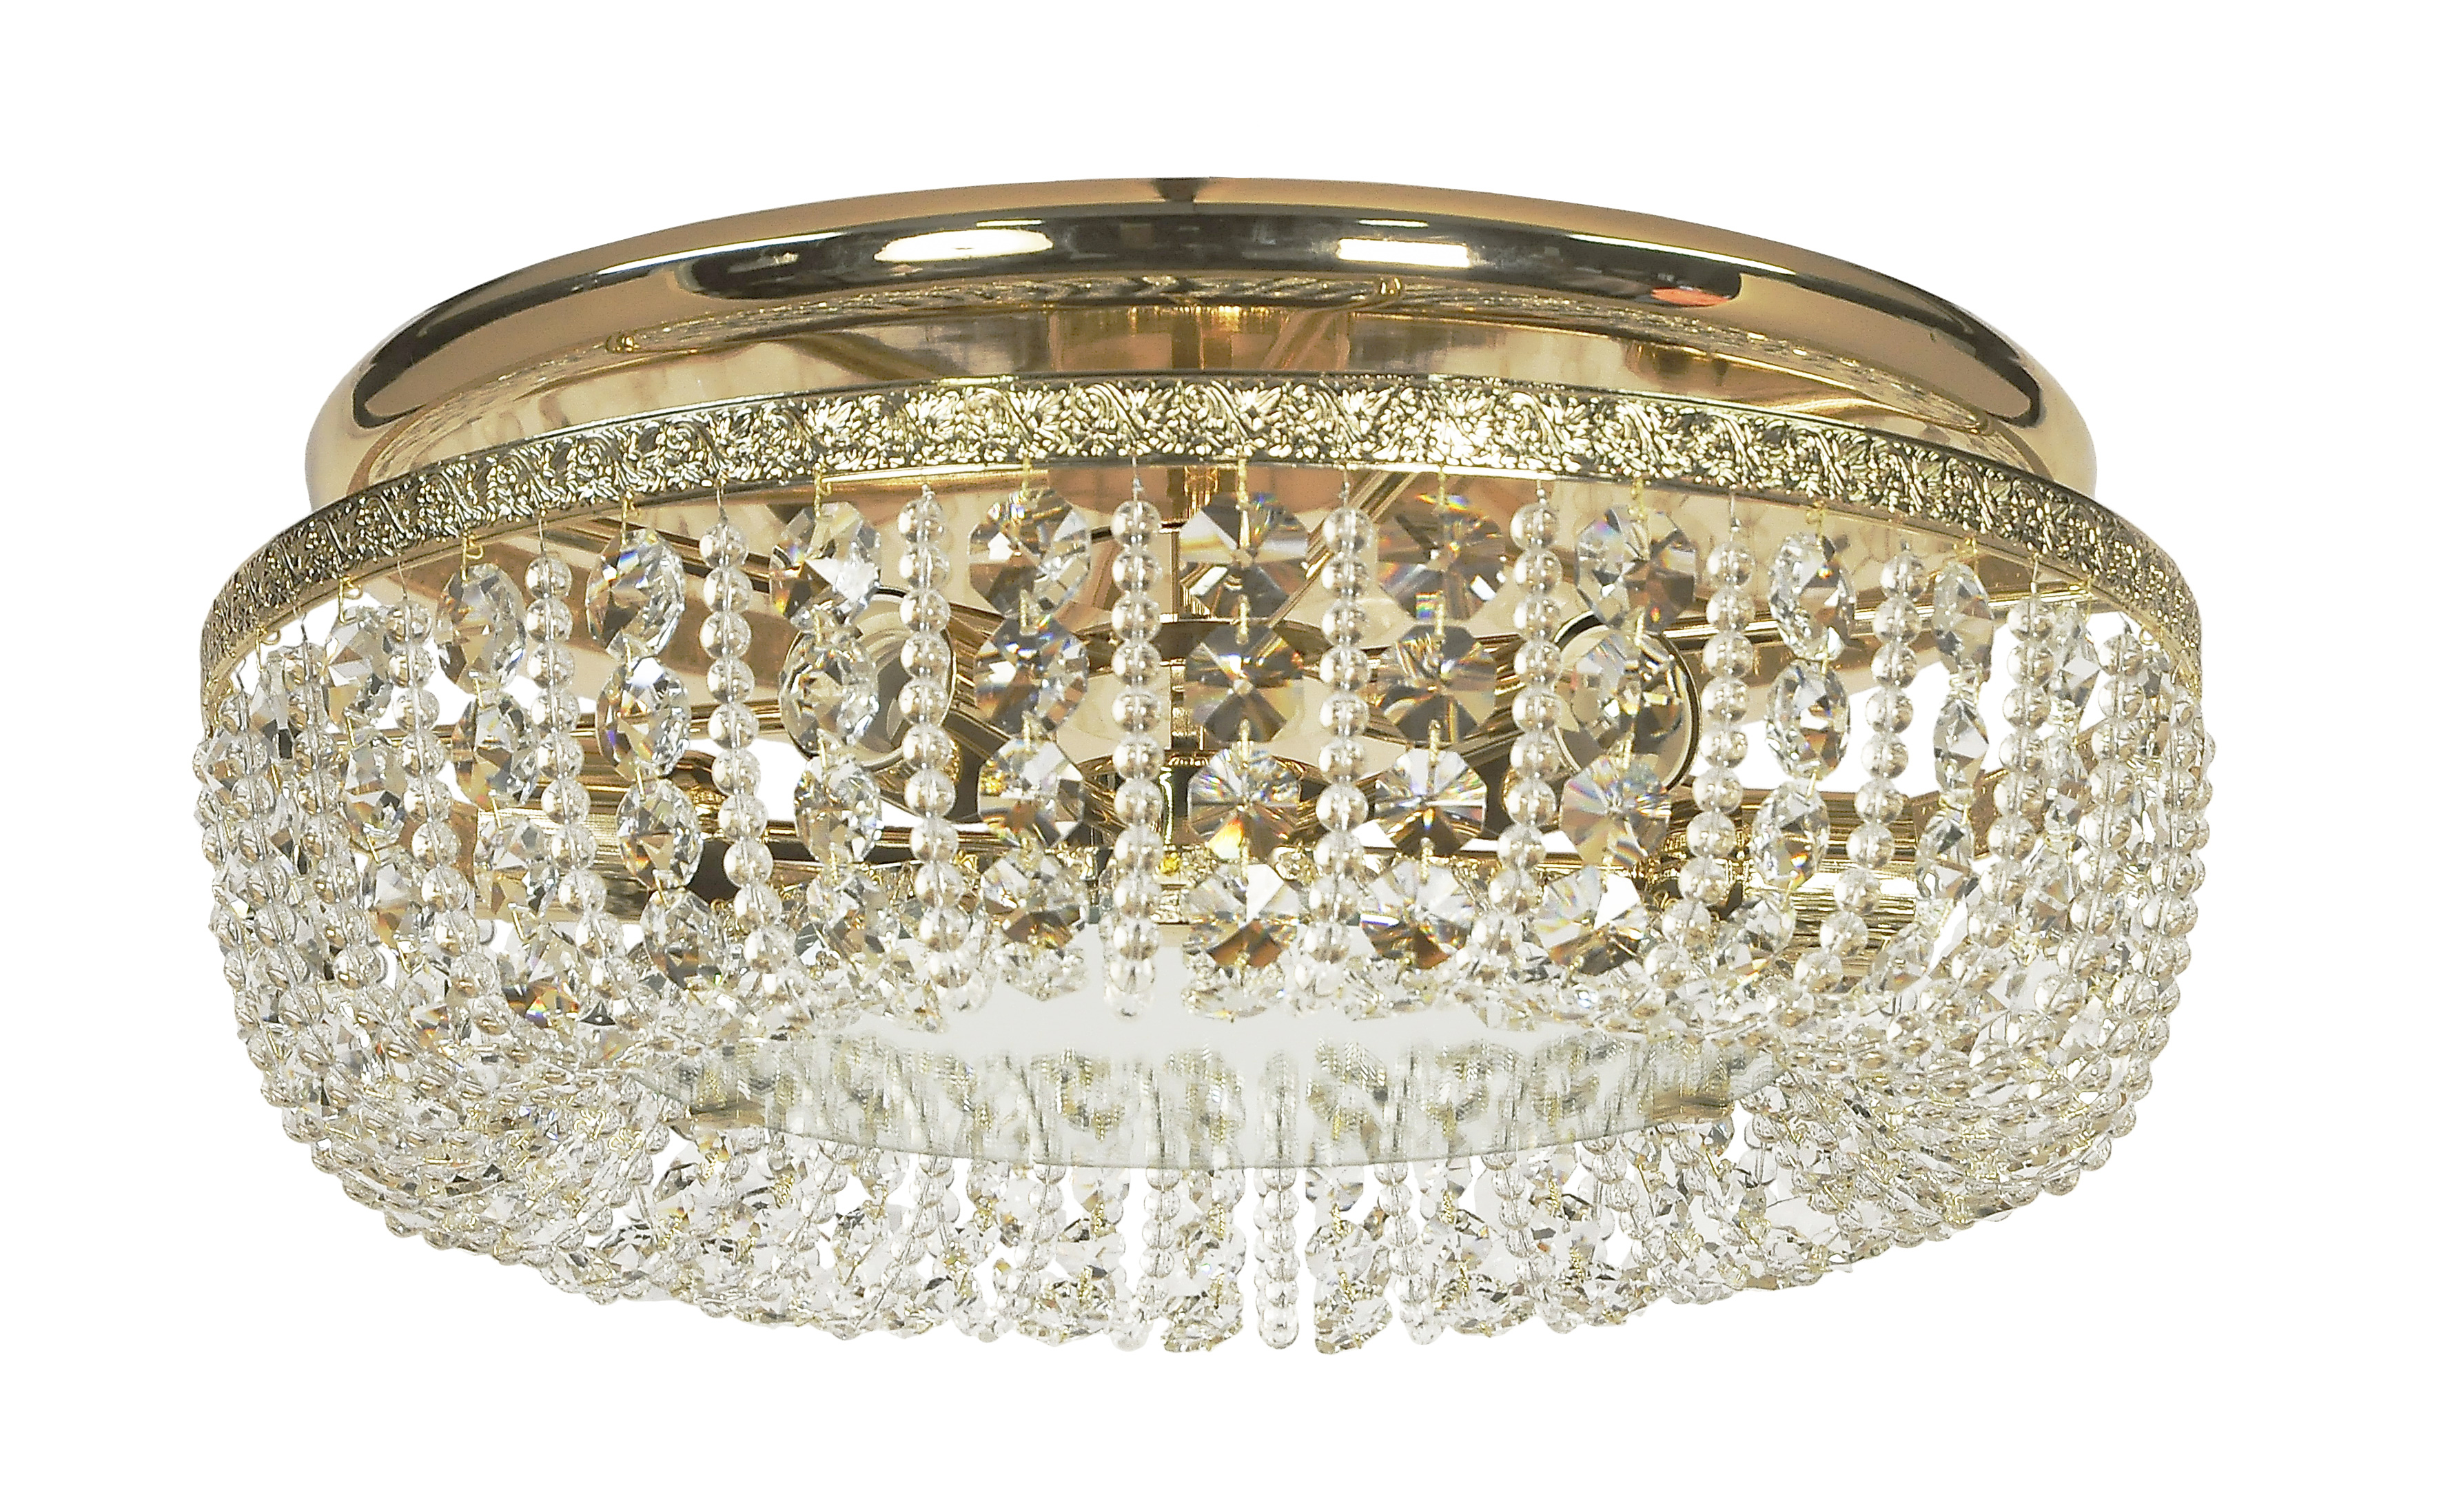 Люстра Arti lampadari Favola e 1445502 g подвесная люстра arti lampadari rufina e 1 1 4 600 n